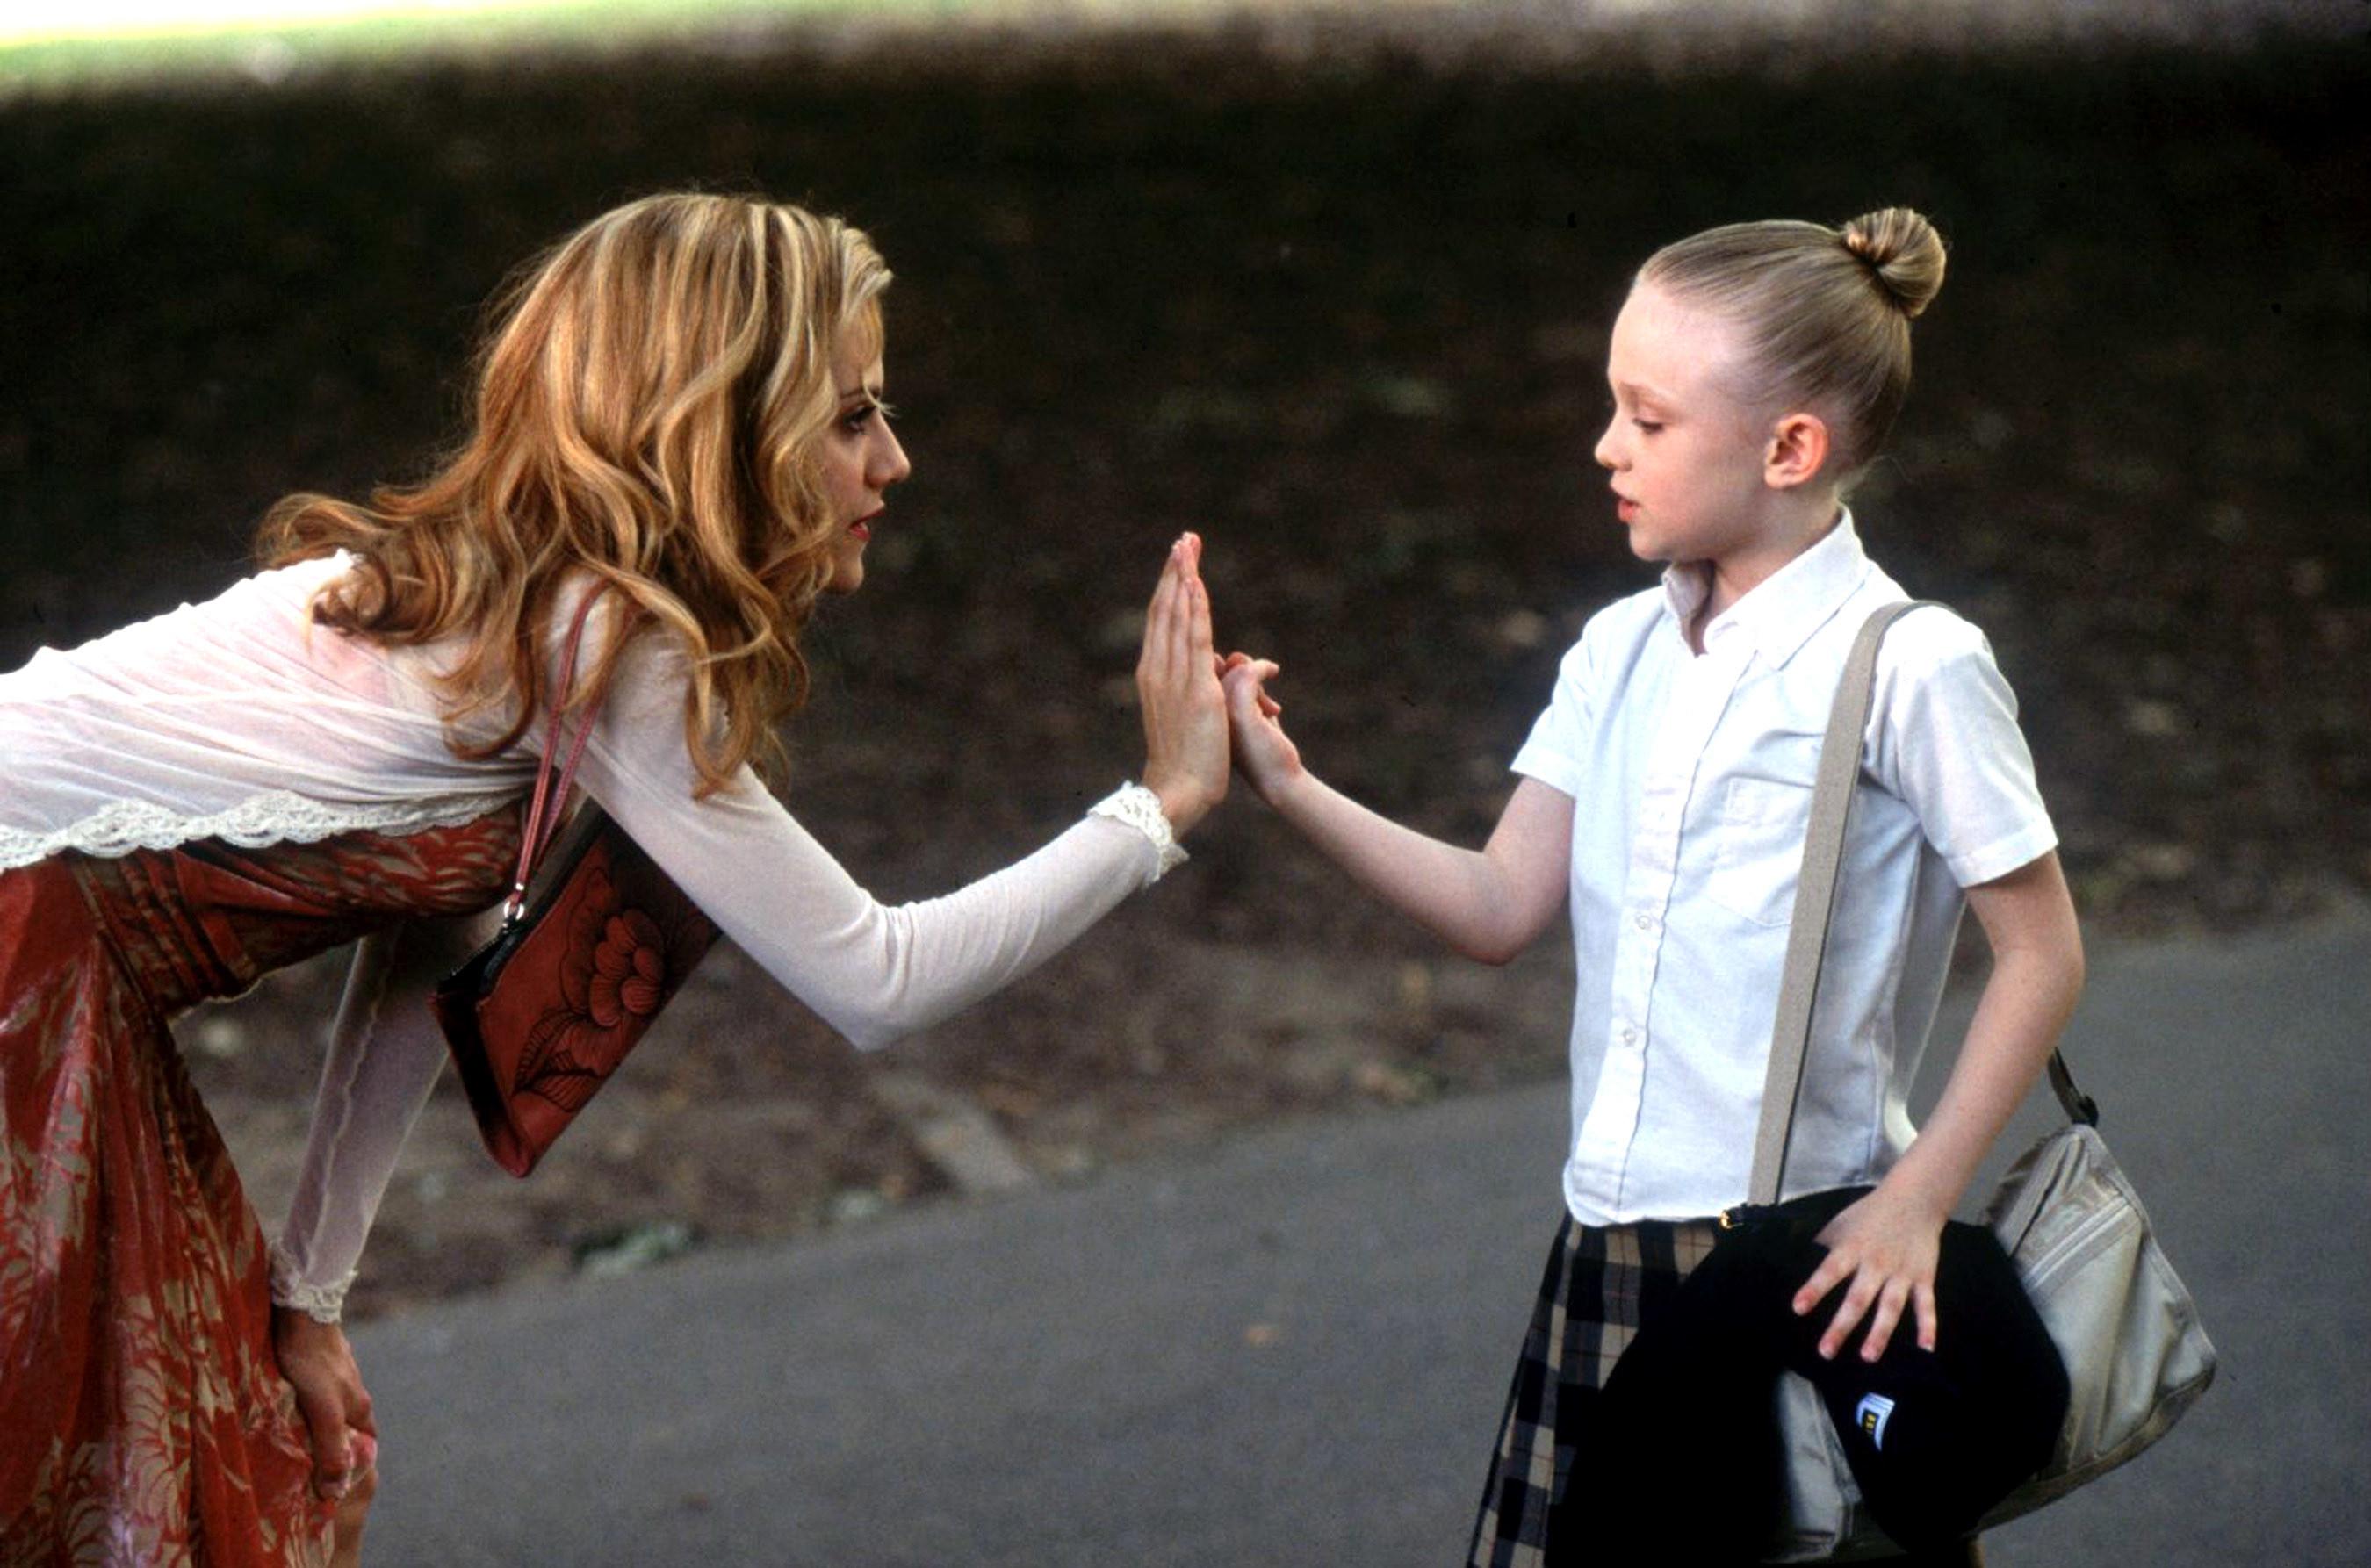 Brittany Murphy and Dakota Fanning in the movie uptown girls